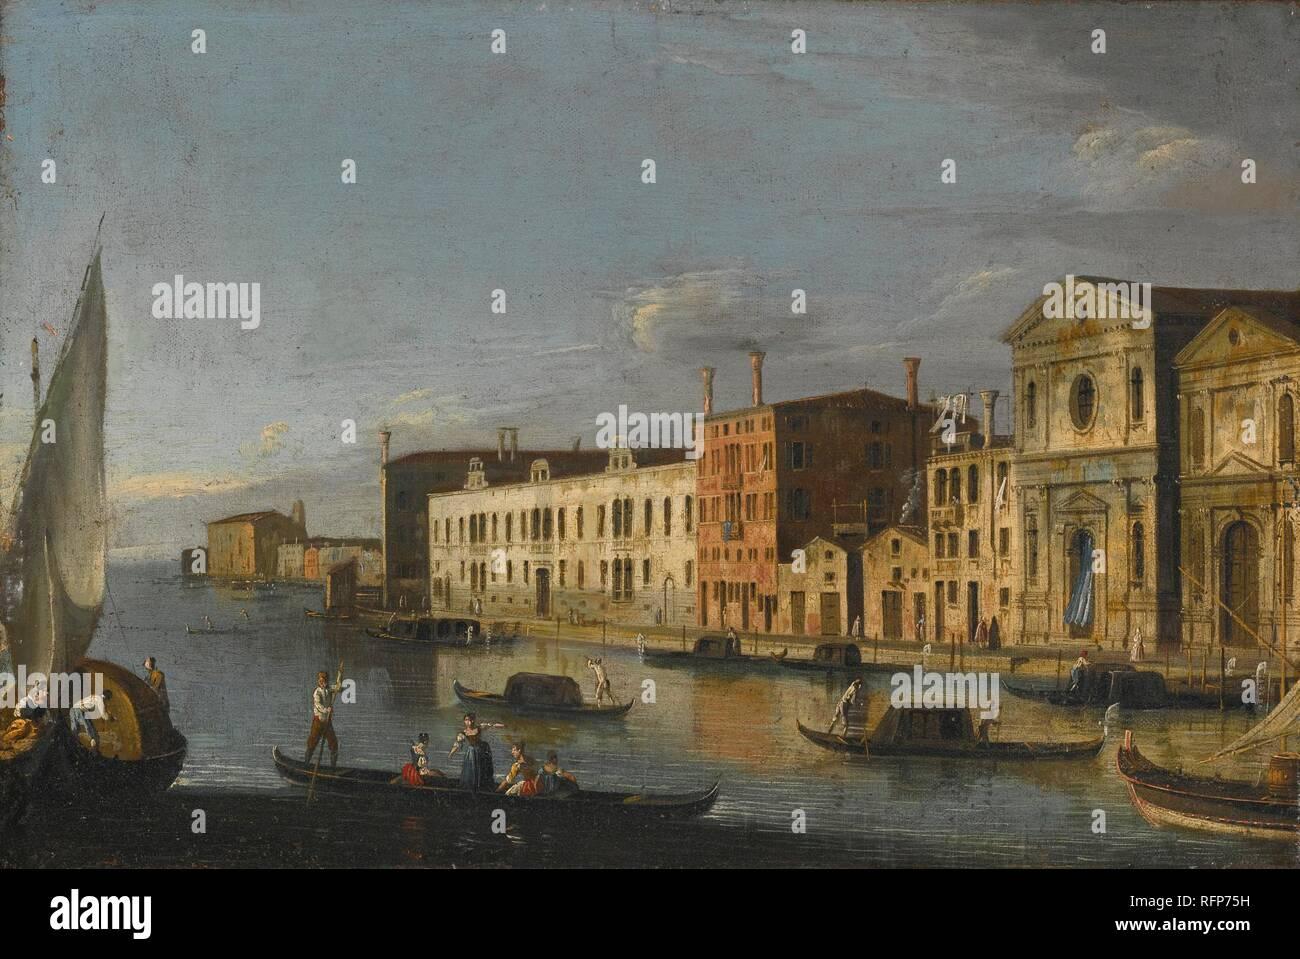 The Master of the Langmatt Foundation Views ACTIVE VENICE CIRCA 1740-1770 VENICE, THE SANTO SPIRITO AND THE ZATTERE.jpg - RFP75H  - Stock Image